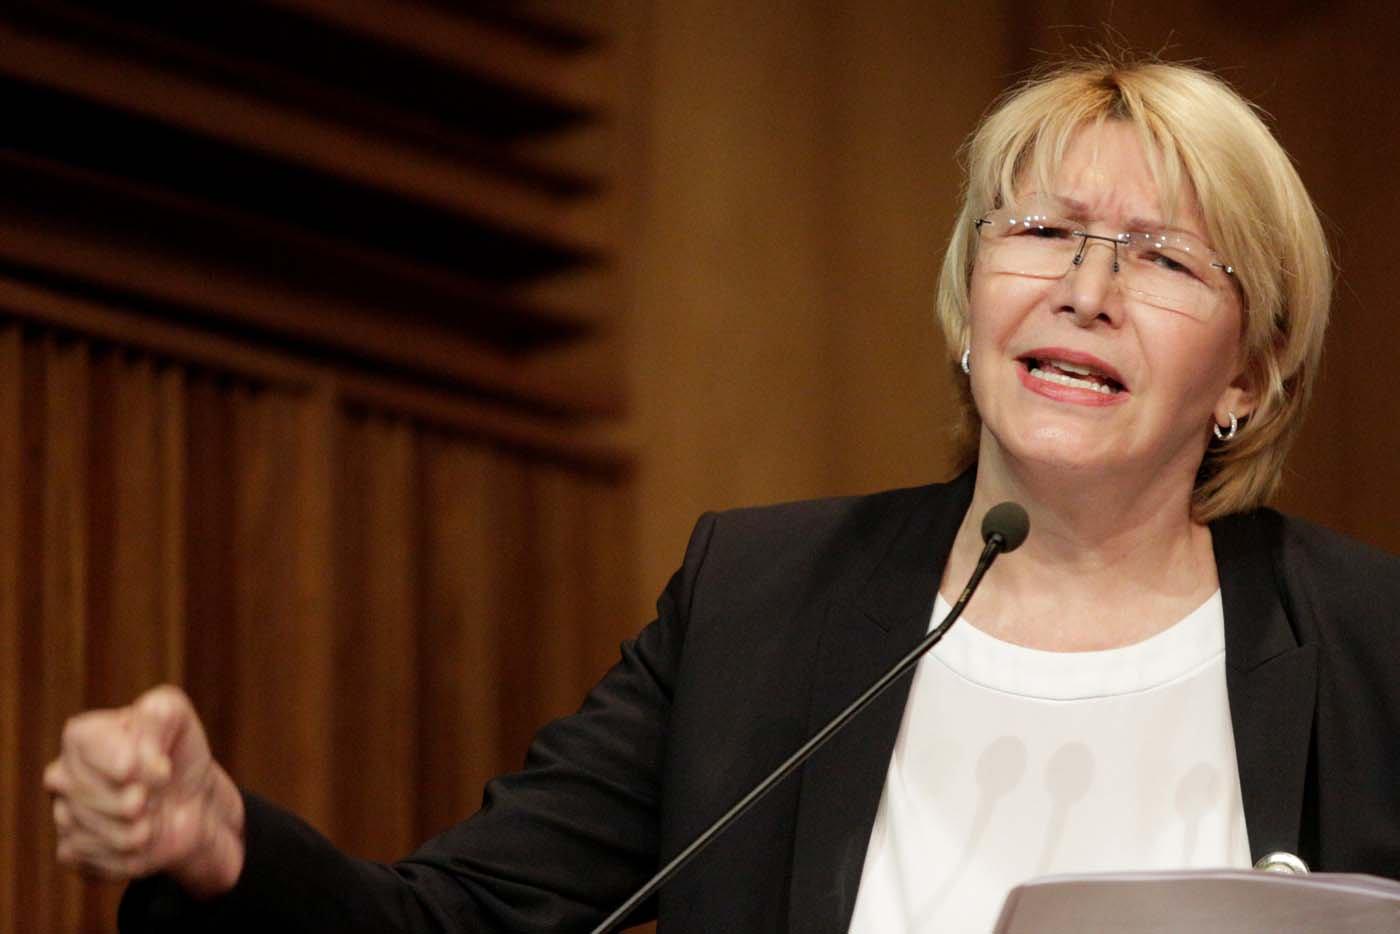 ANC designó a Tarek William Saab como Fiscal General provisional